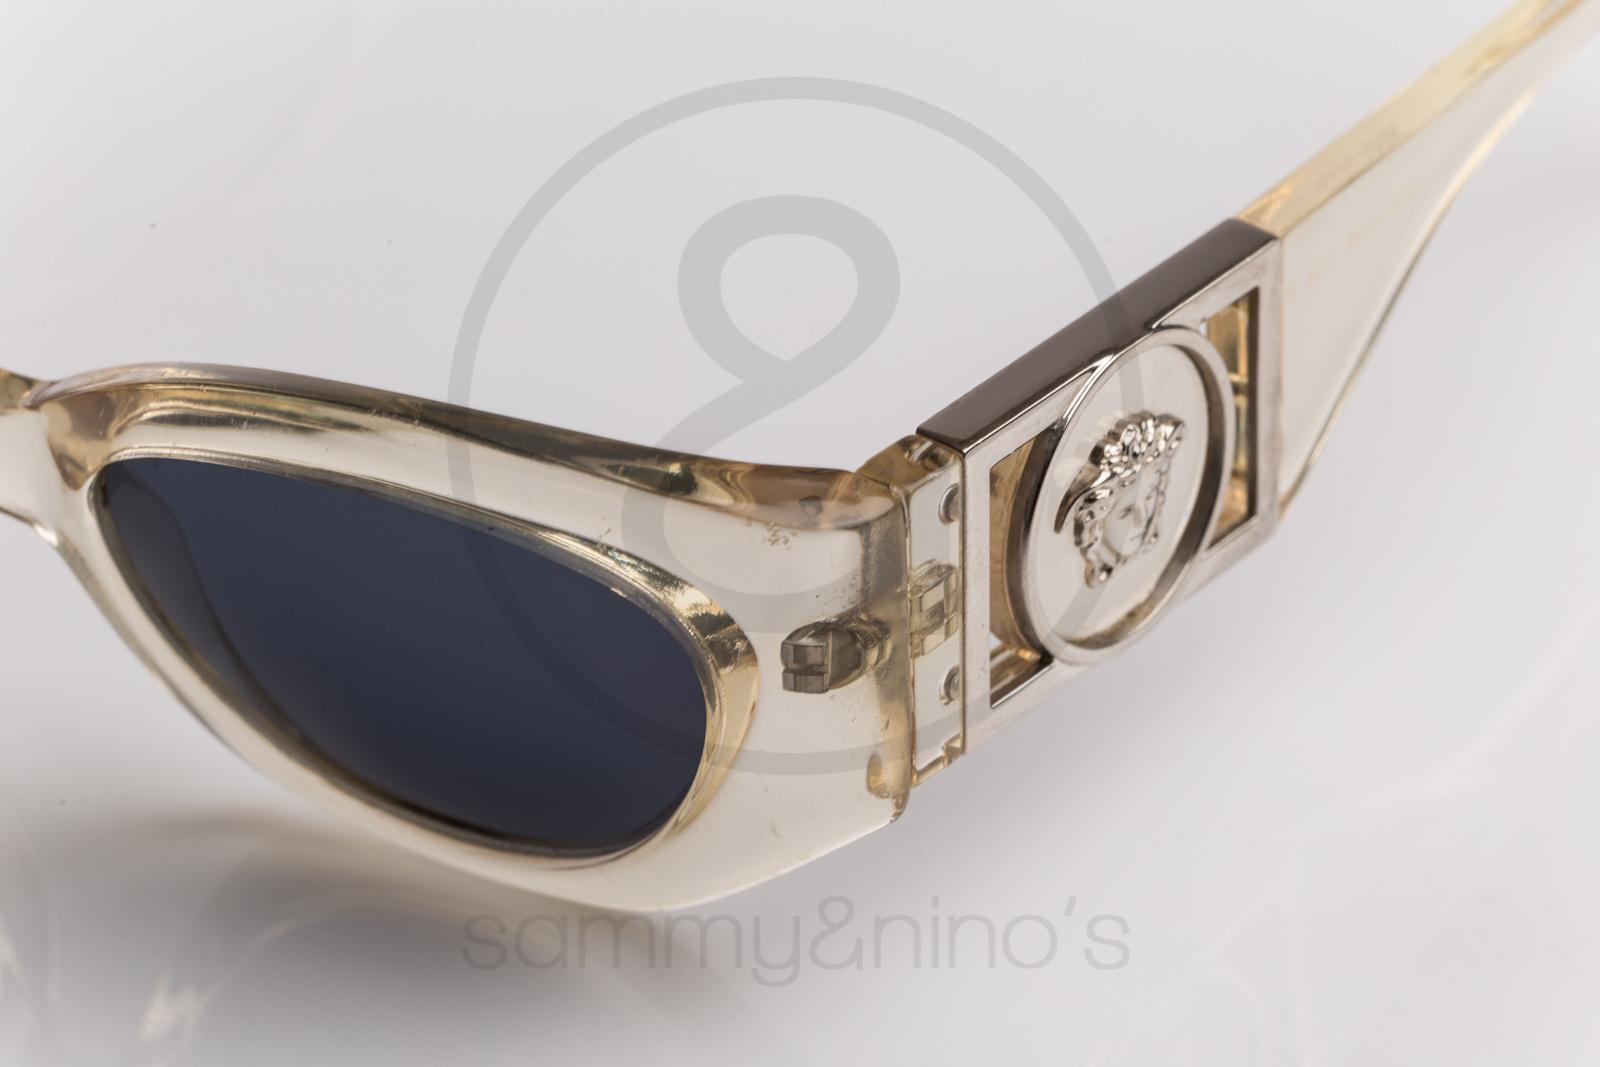 599a2518d06 Previous  Next. HomeSOLD OUTGianni Versace 420 b 924